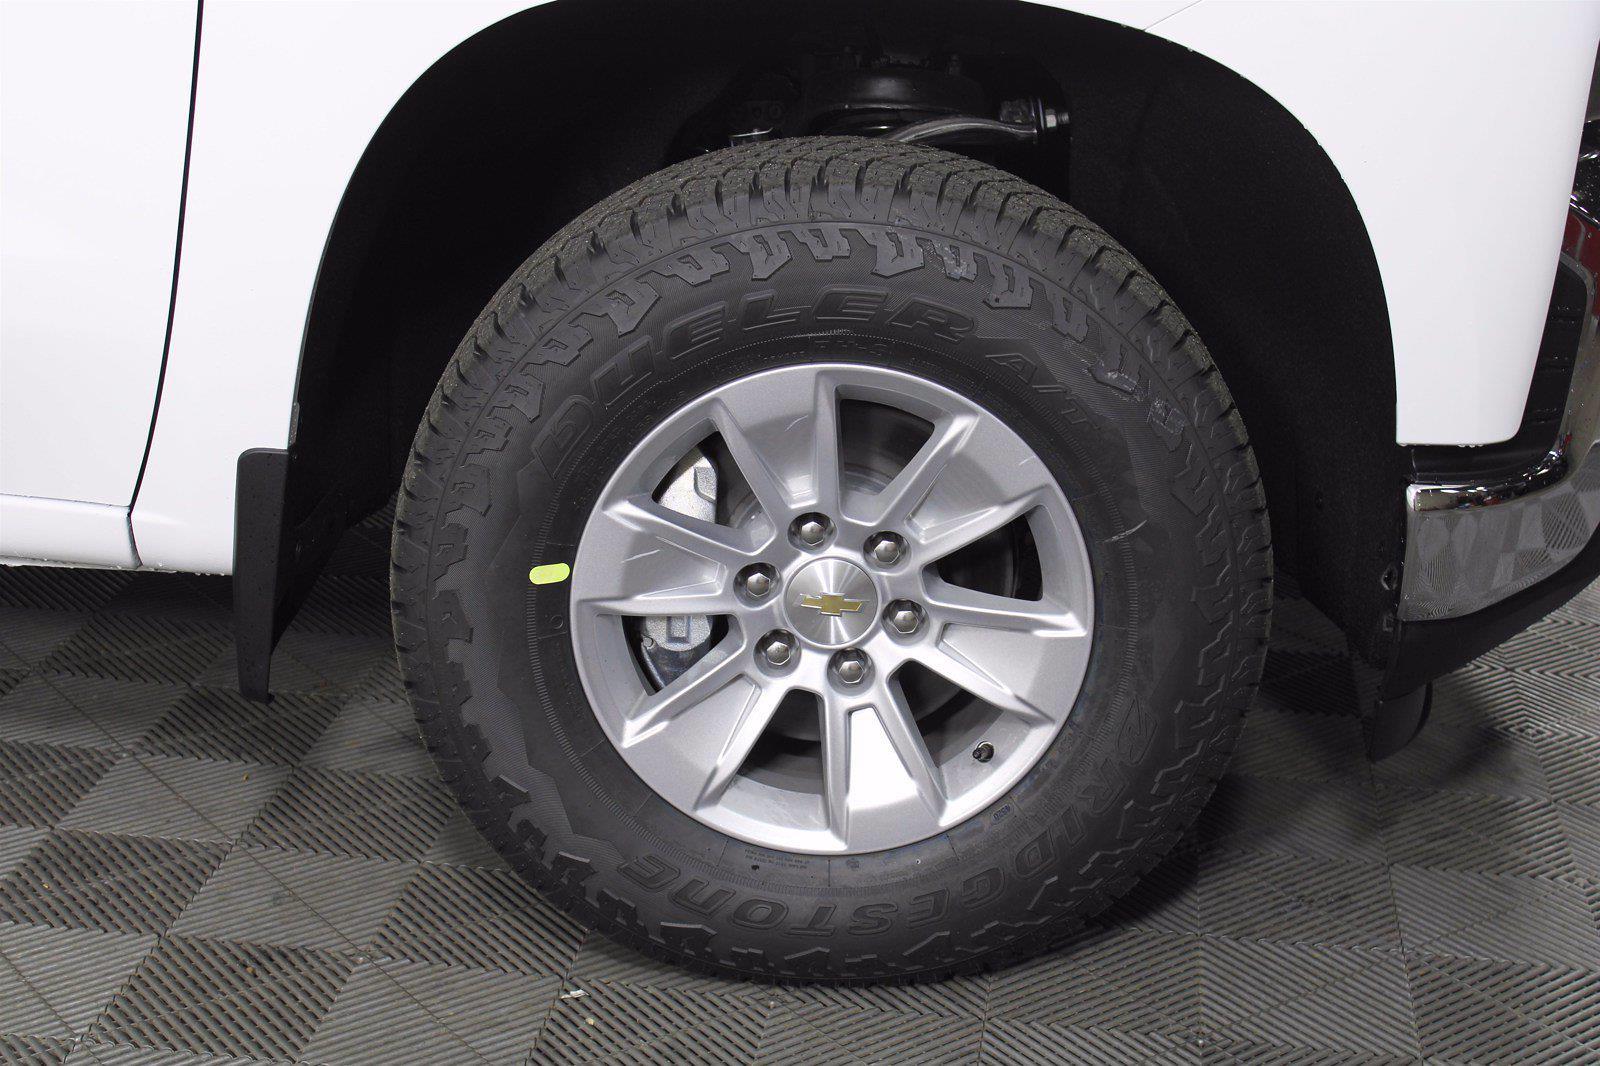 2021 Chevrolet Silverado 1500 Regular Cab 4x2, Pickup #D110918 - photo 6